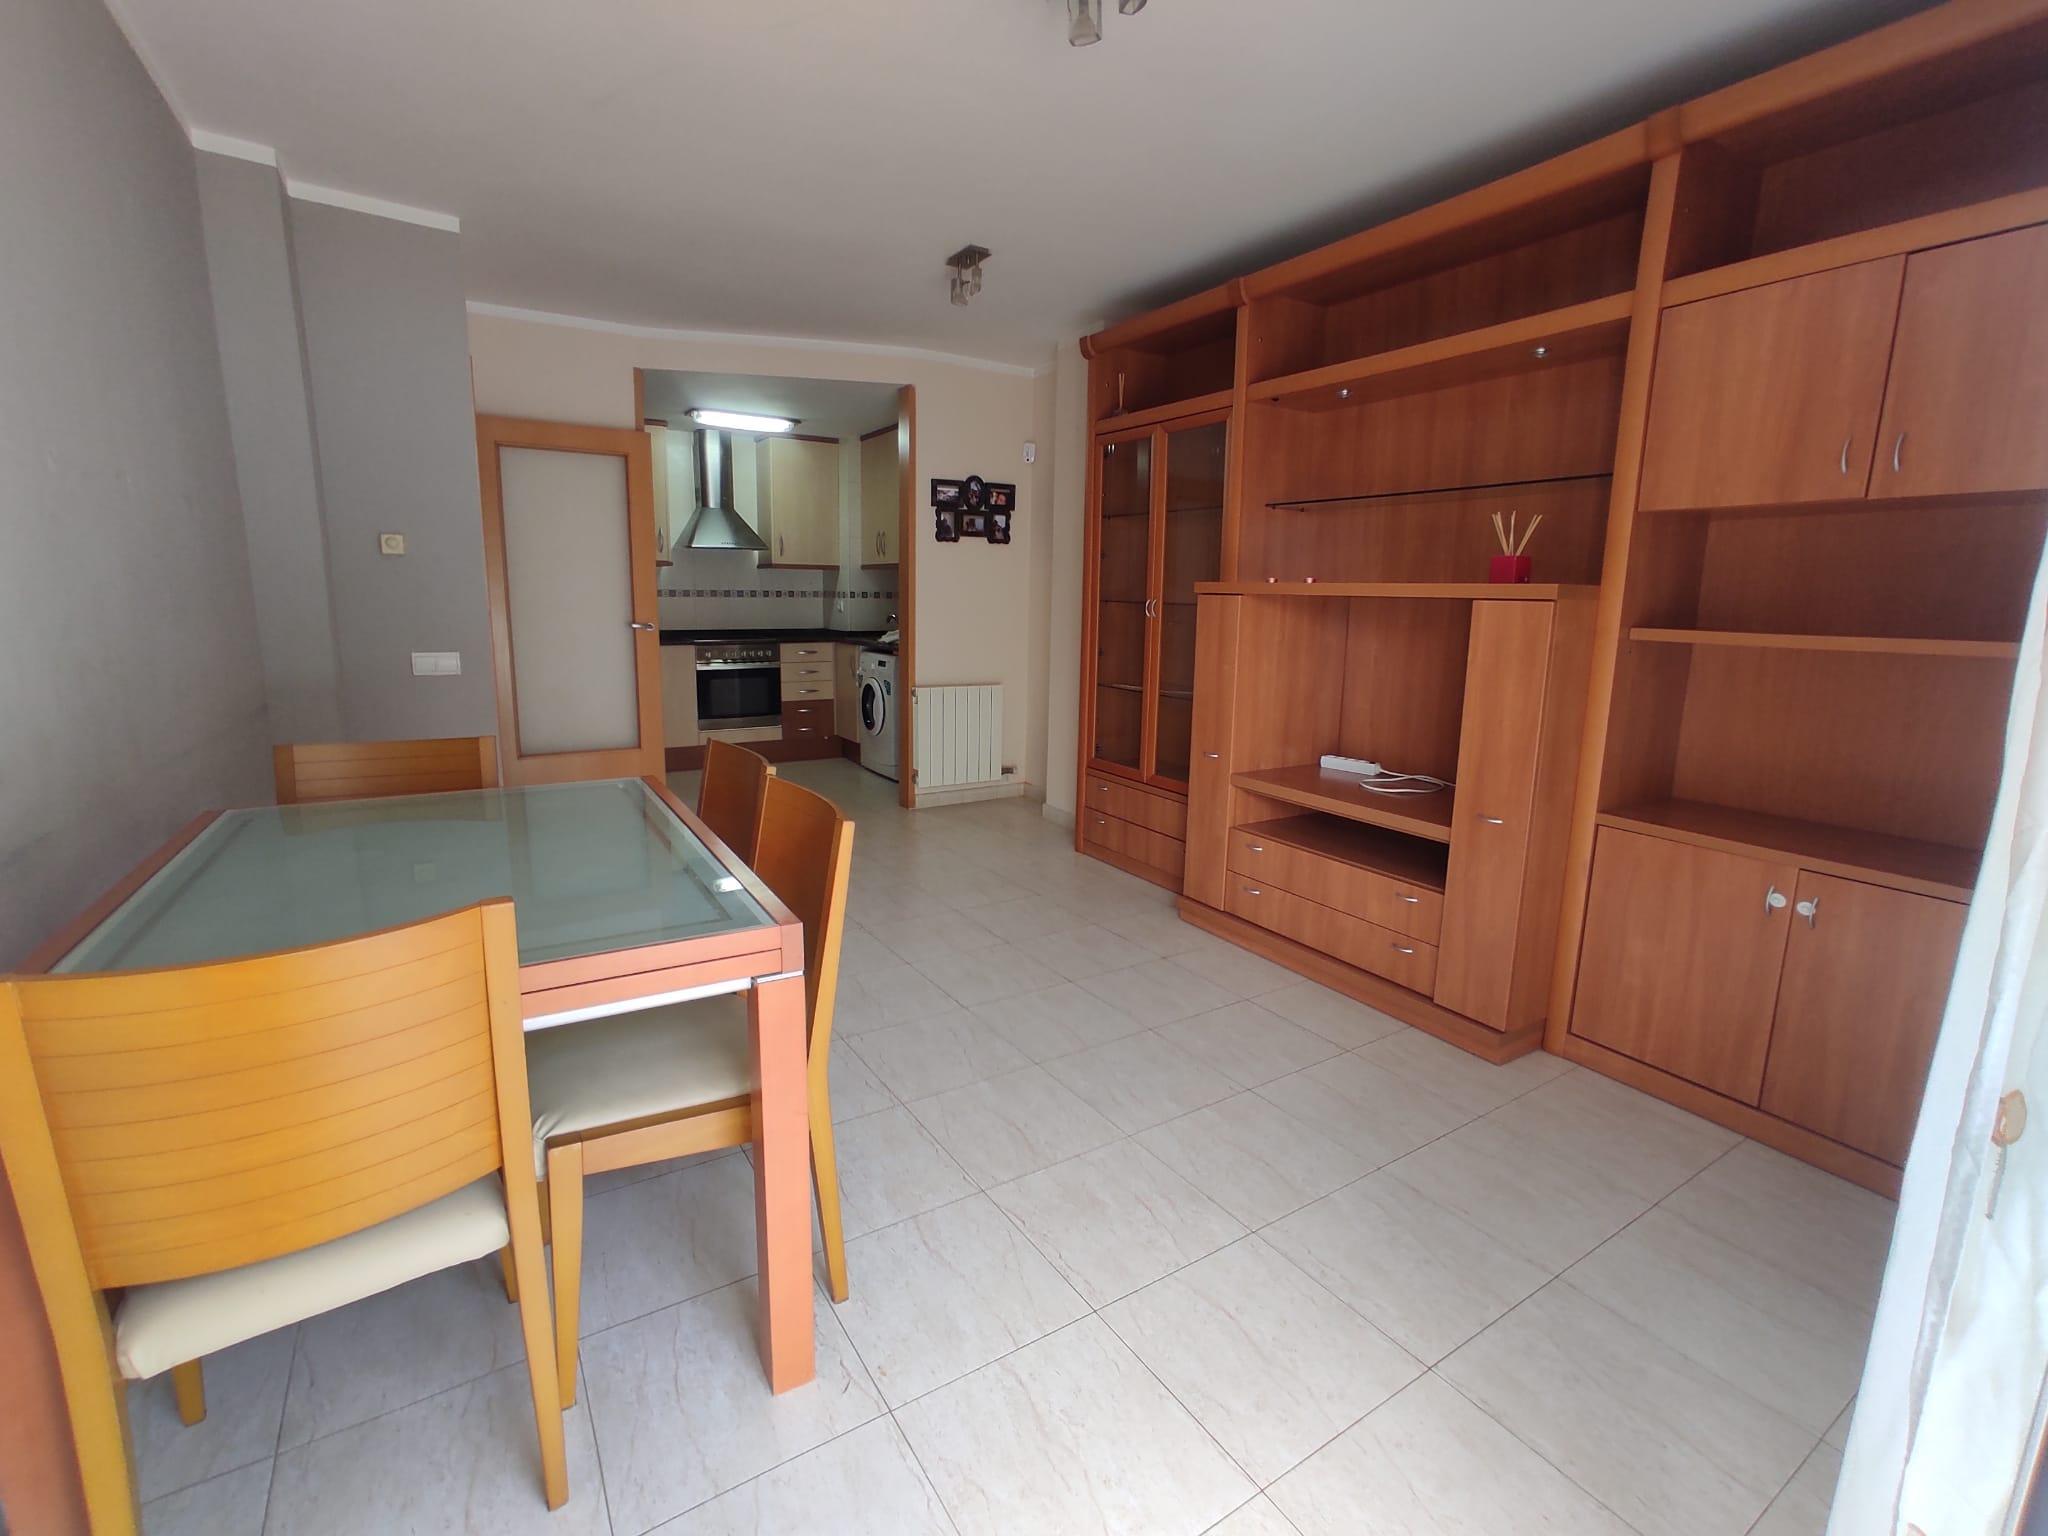 Piso en Centre en Sant Boi de Llobregat en Venta por 198.000€